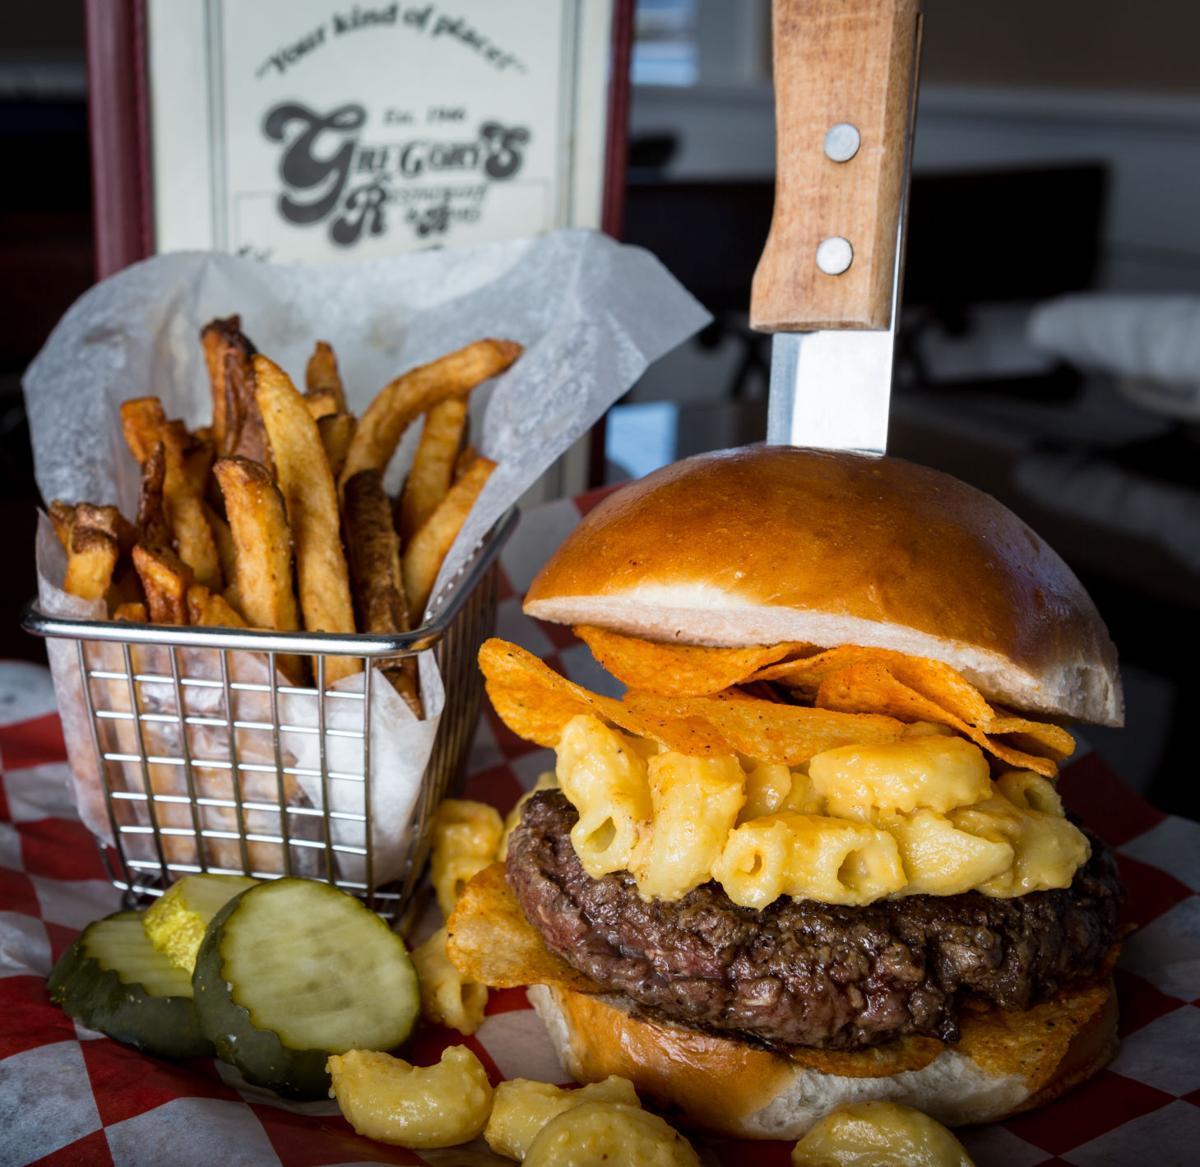 041317_acw_burgerbash